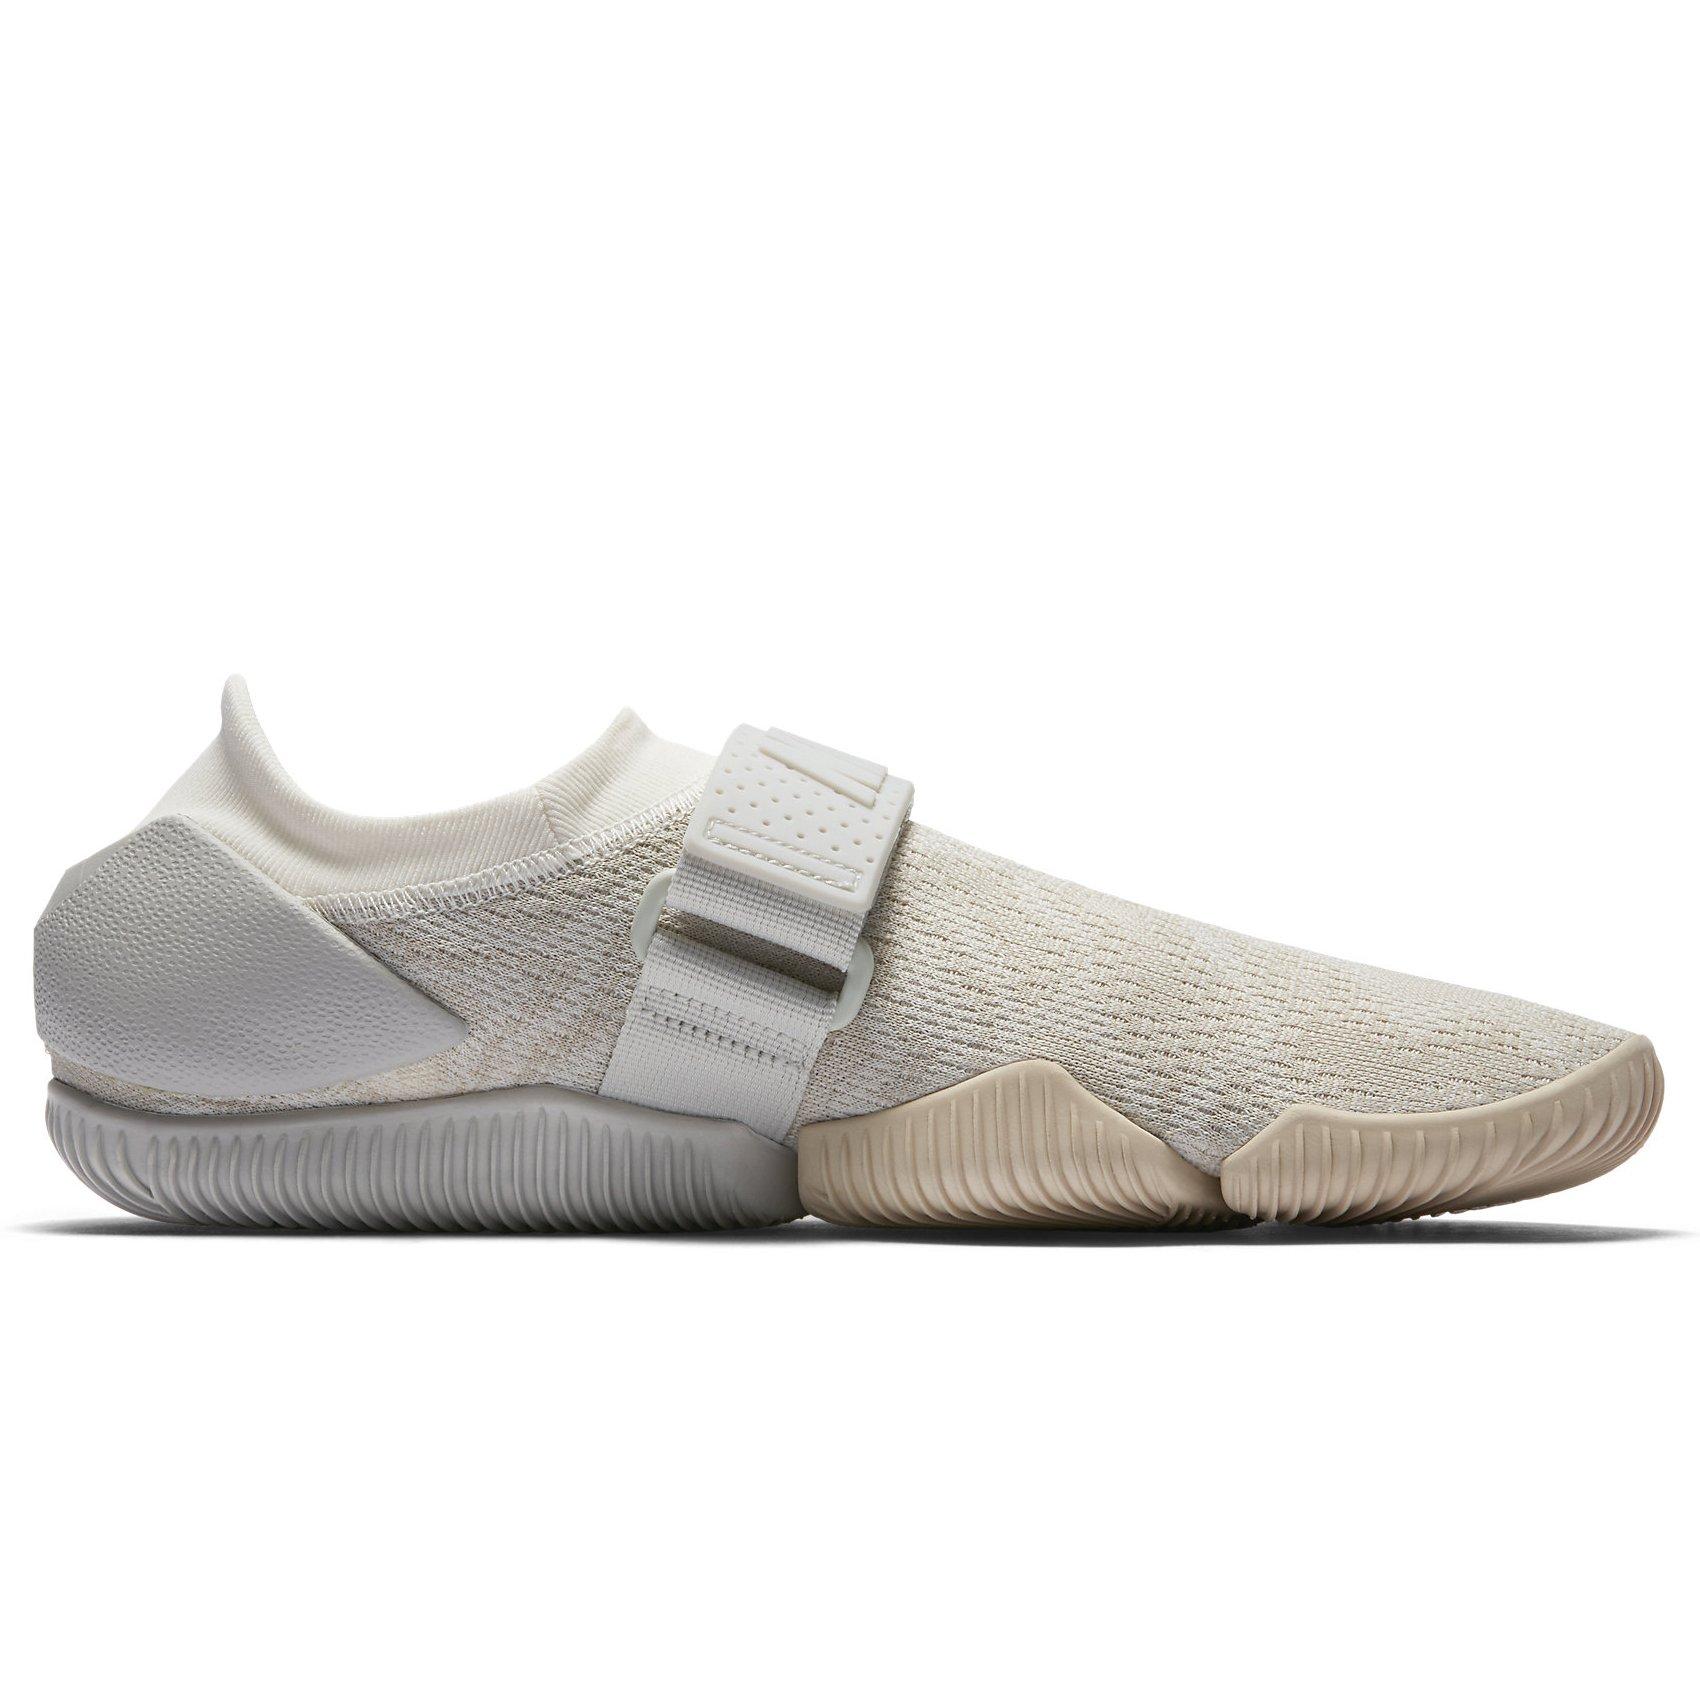 NIKE Aqua Sock 360 QS 902782 100 Oatmeal/Light Bone/Sail/Black Men's Water Shoes (8) by NIKE (Image #6)